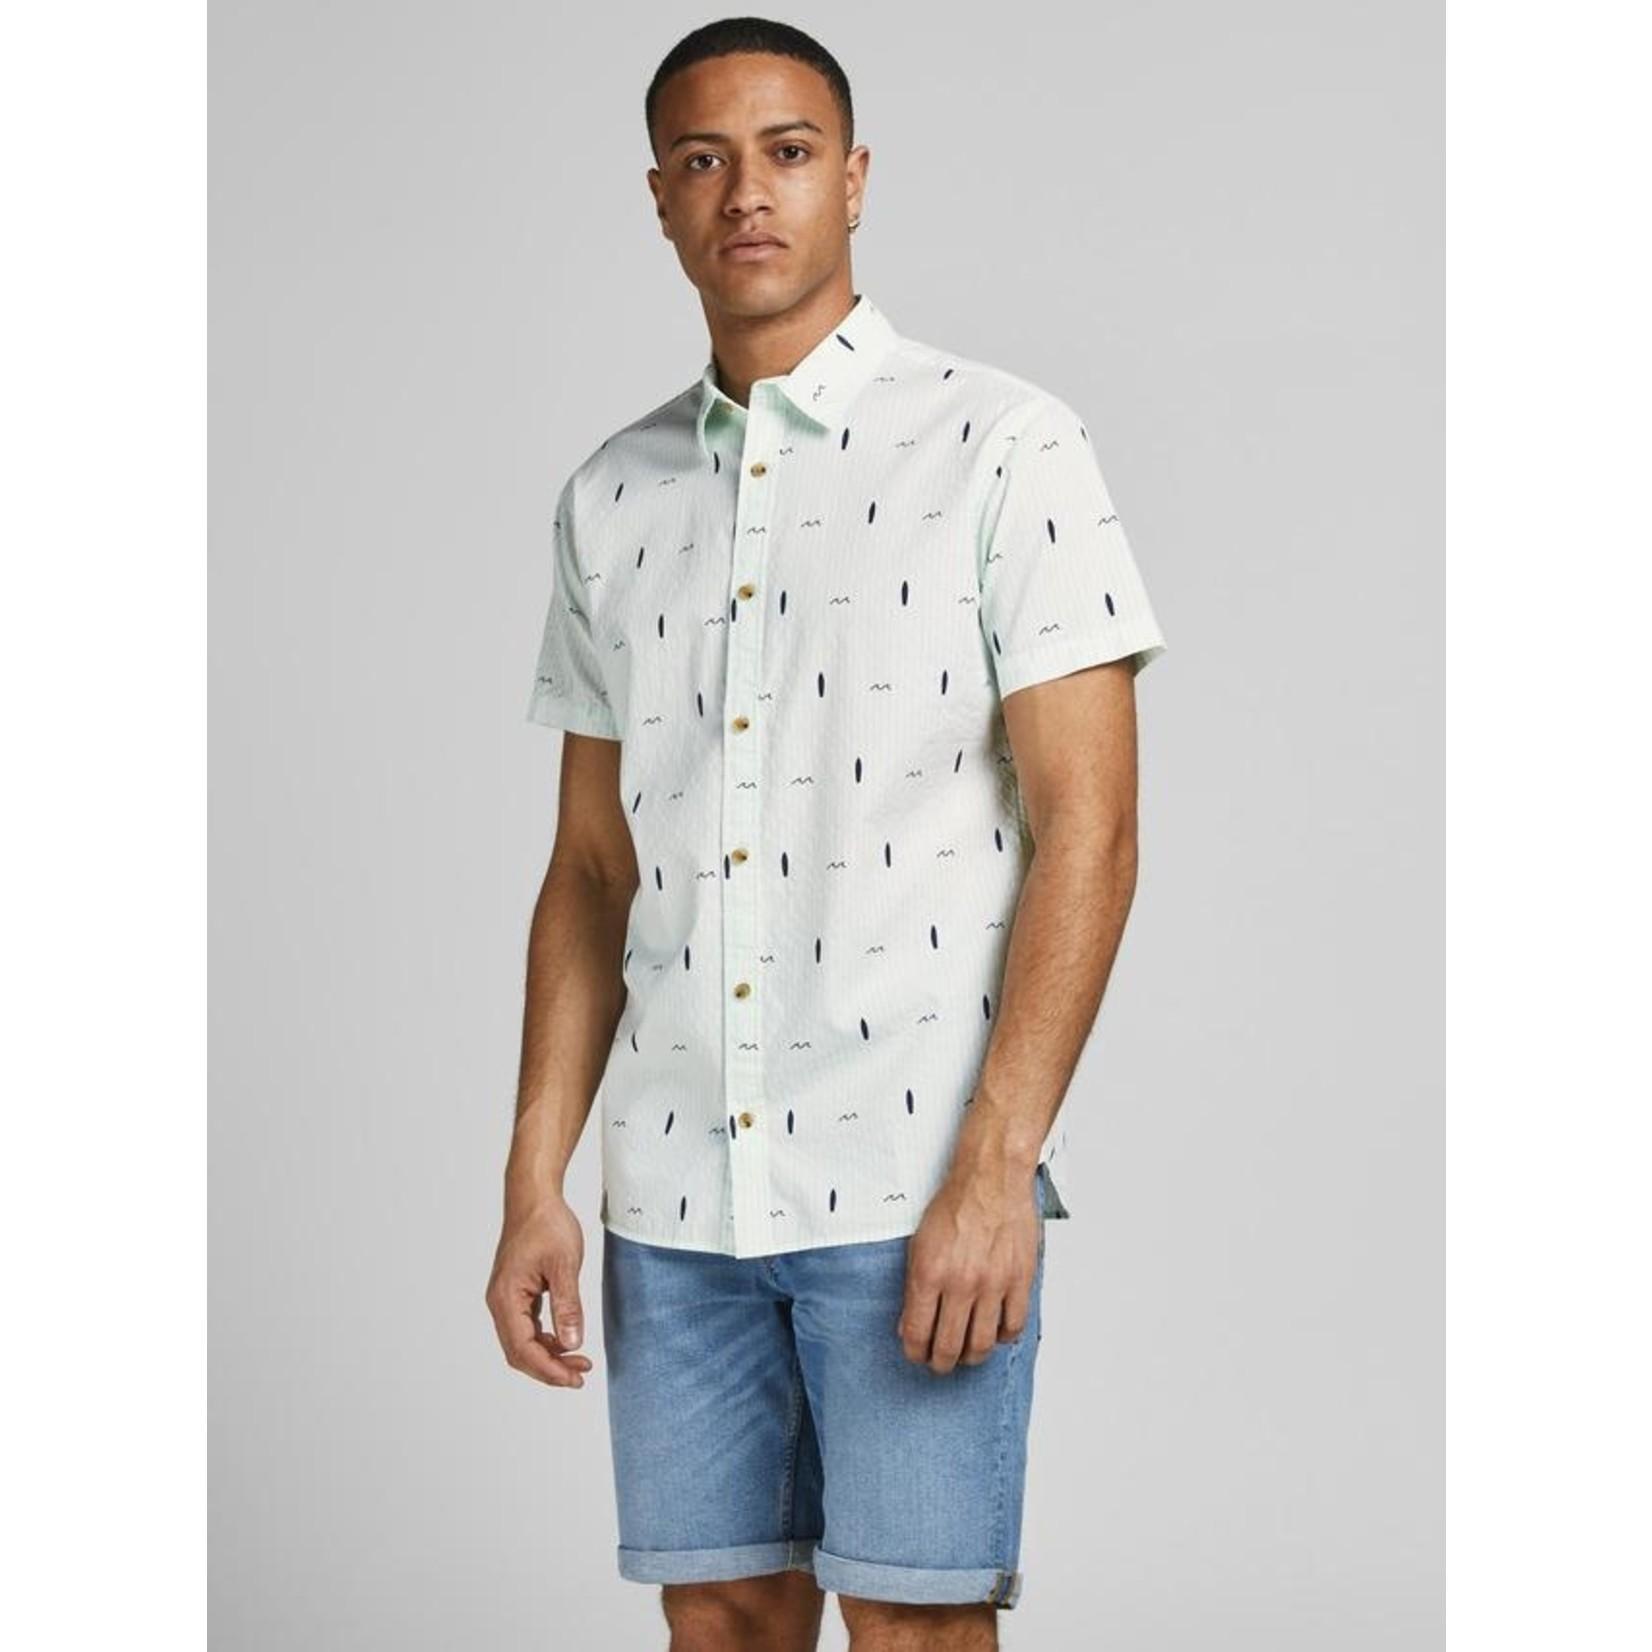 Jack & Jones Jack & Jones 12187951 Poolside Short-Sleeve Shirt - Pale Blue